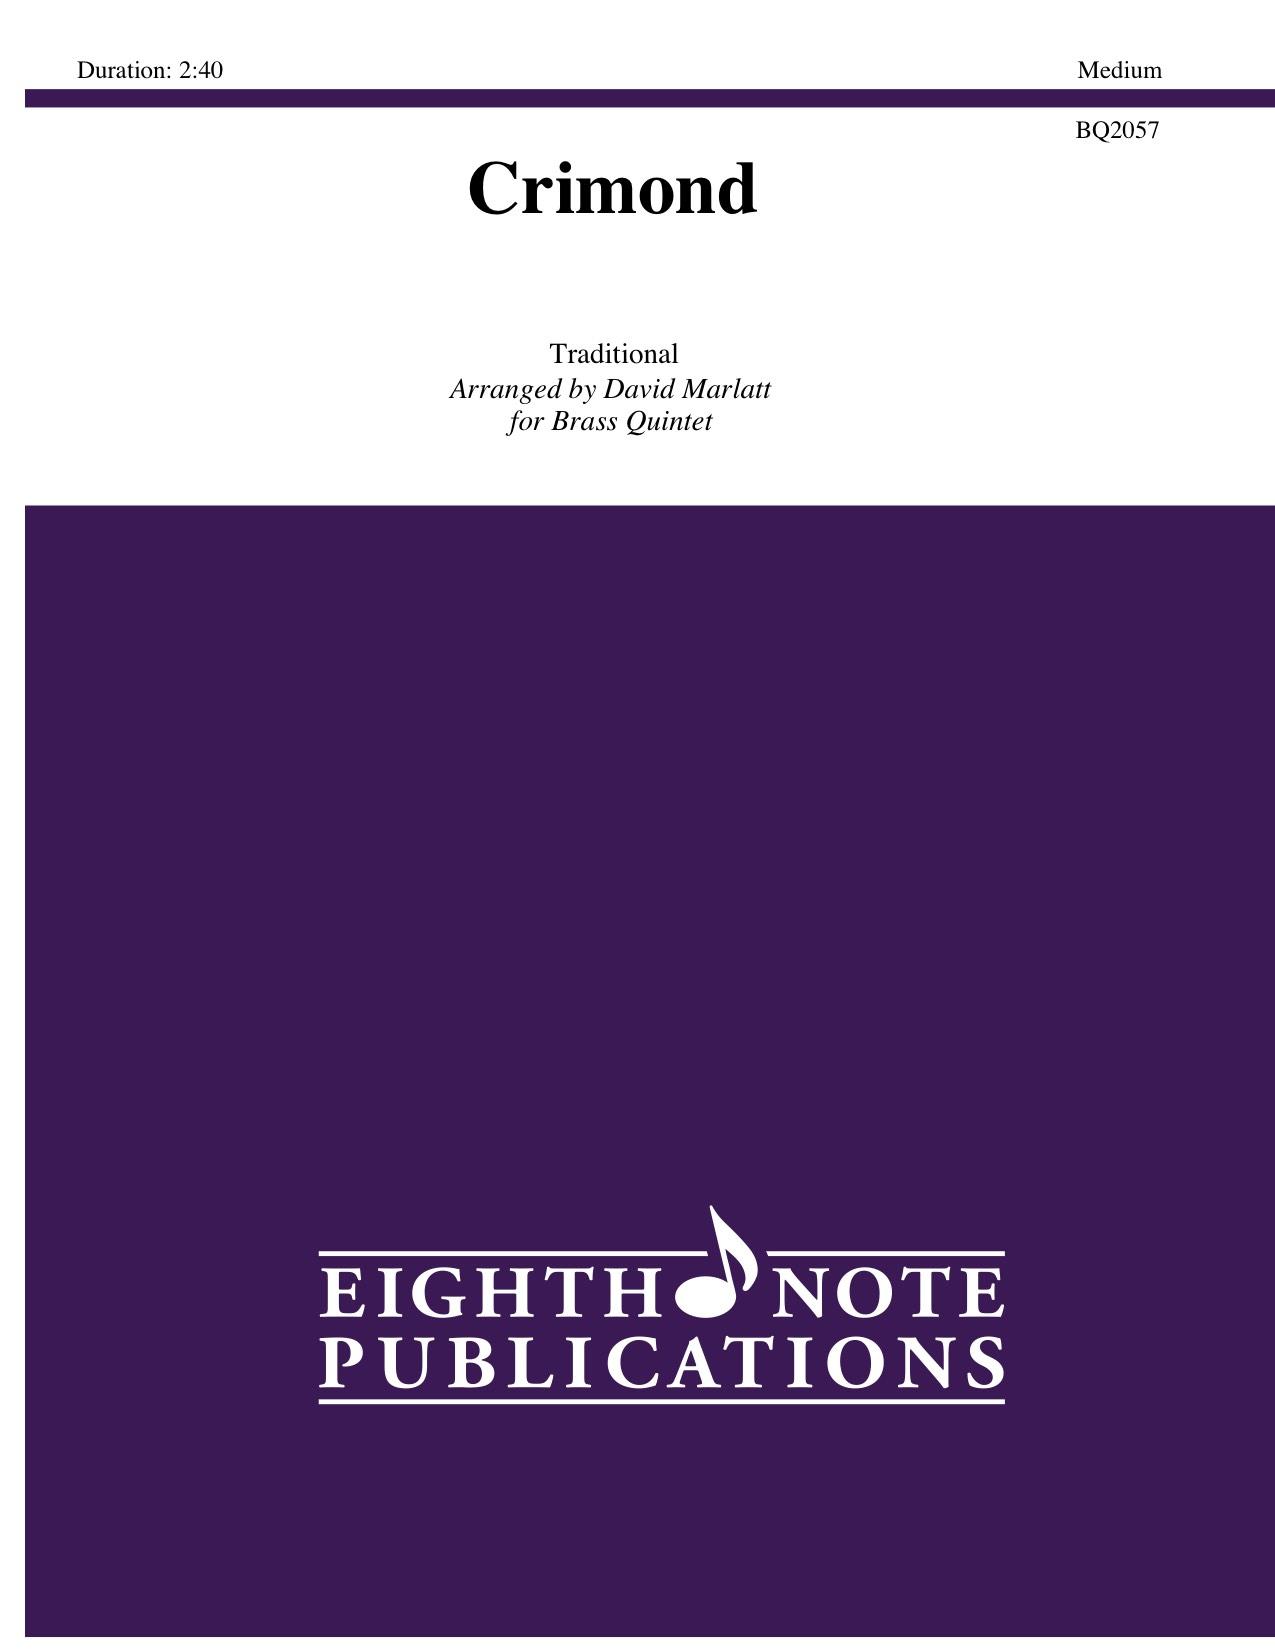 Crimond -  Traditional